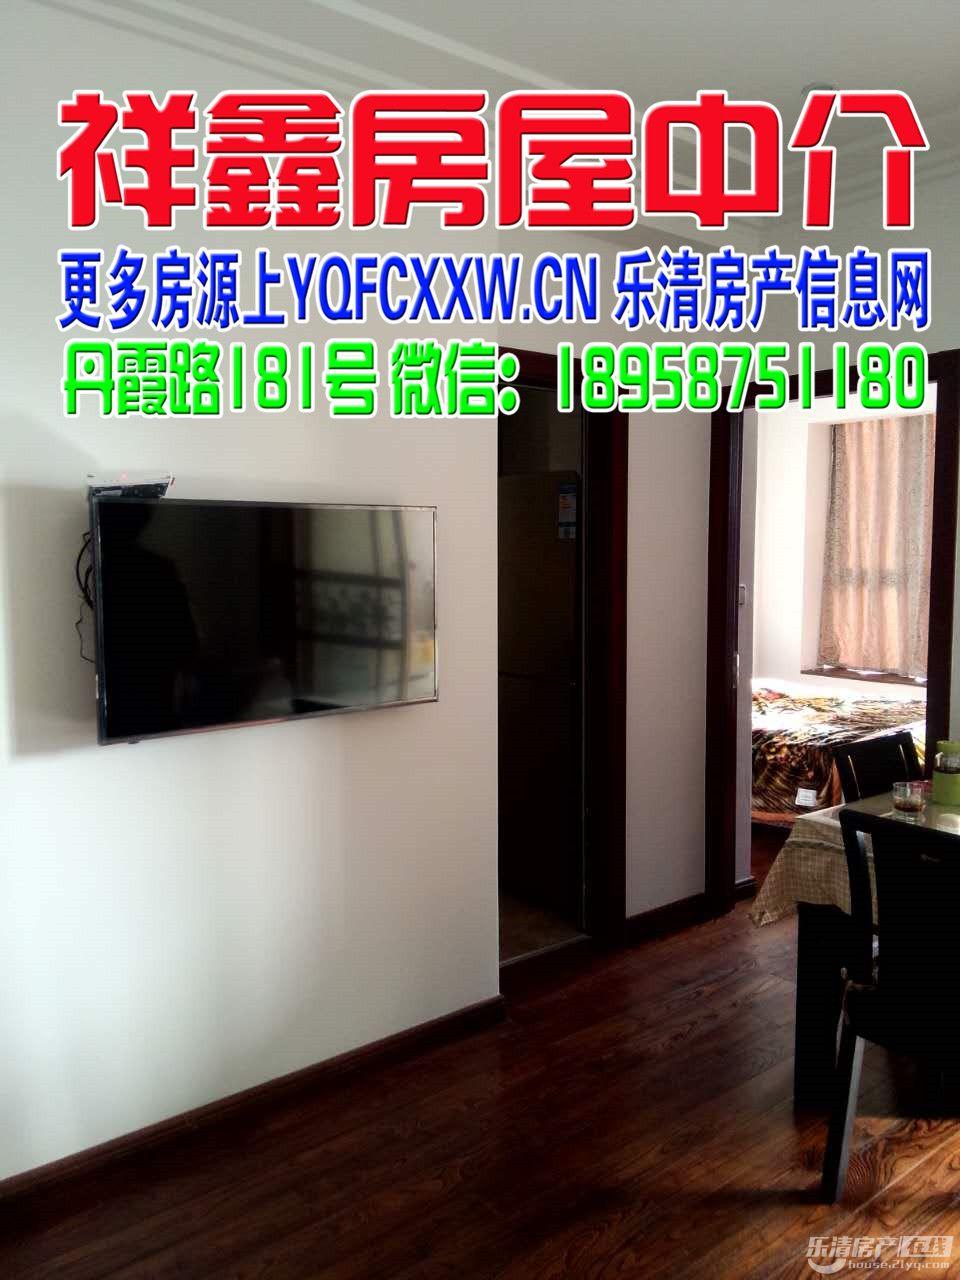 http://house.21yq.com/userfiles/image/20160630/3014114829881195783601.jpg